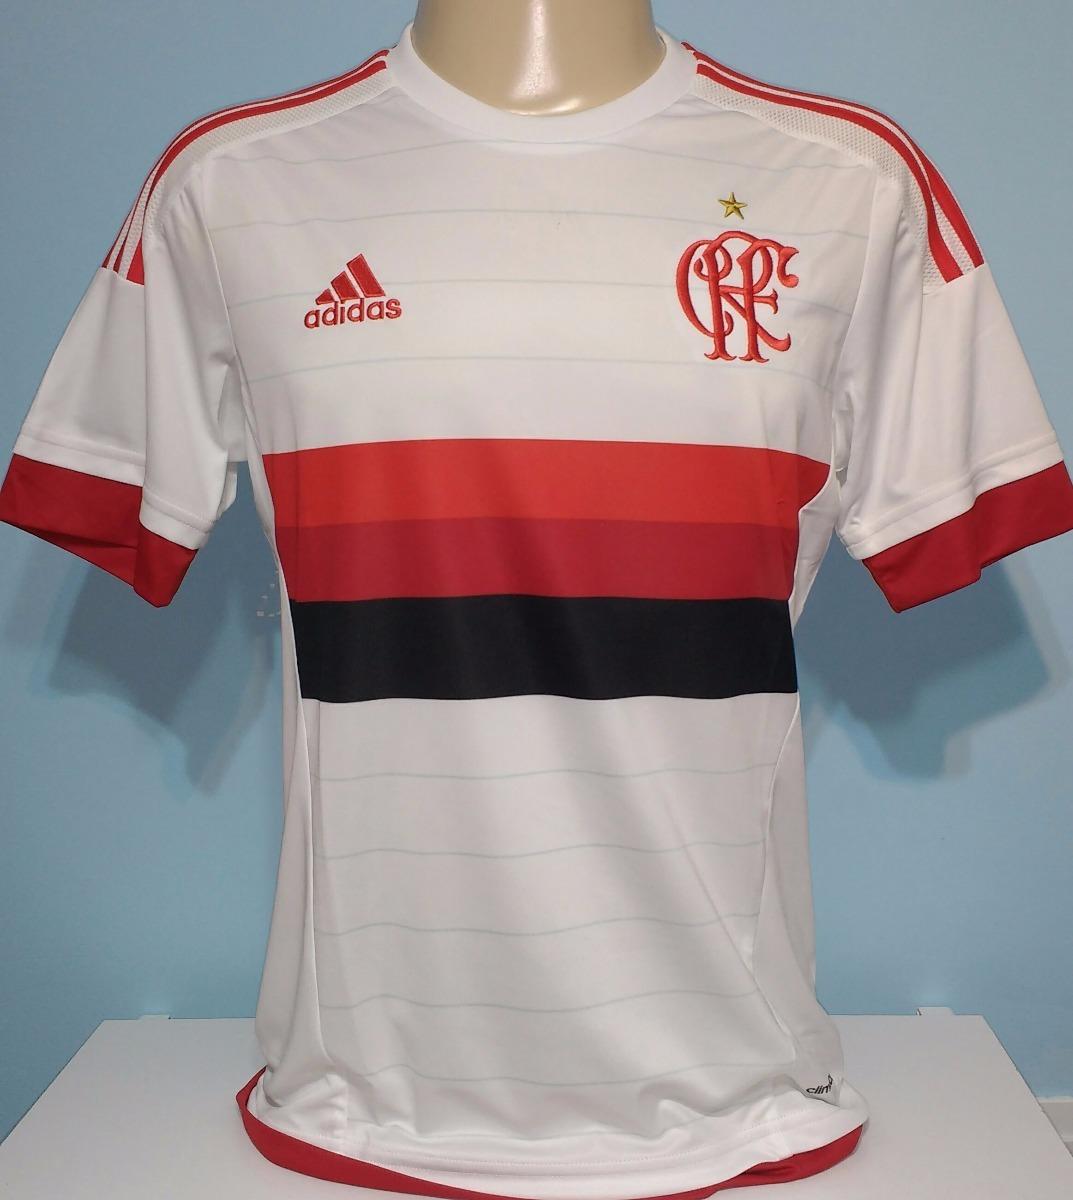 4c60393960 camisa flamengo 2016 branca original adidas - 20. Carregando zoom.